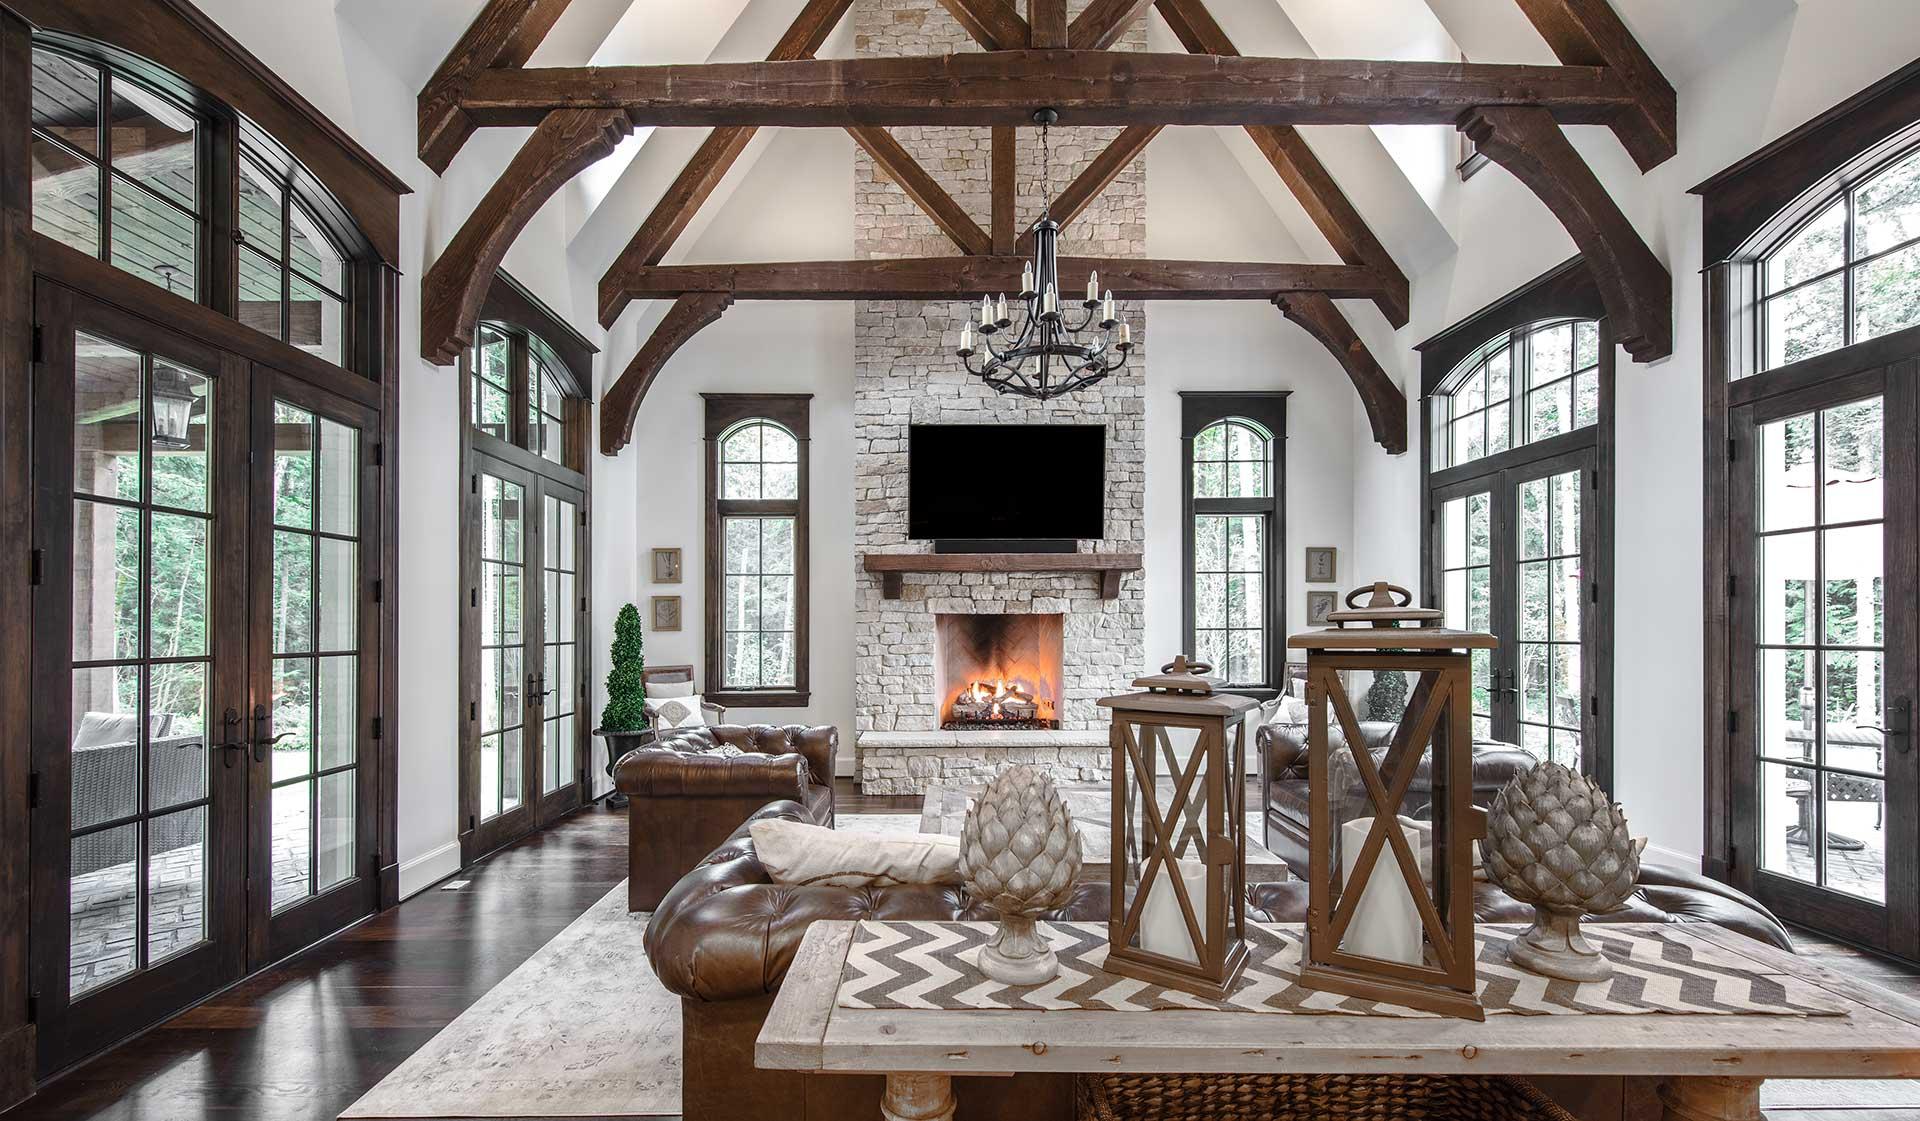 Design Guild Homes Grand Ridge Chteau custom